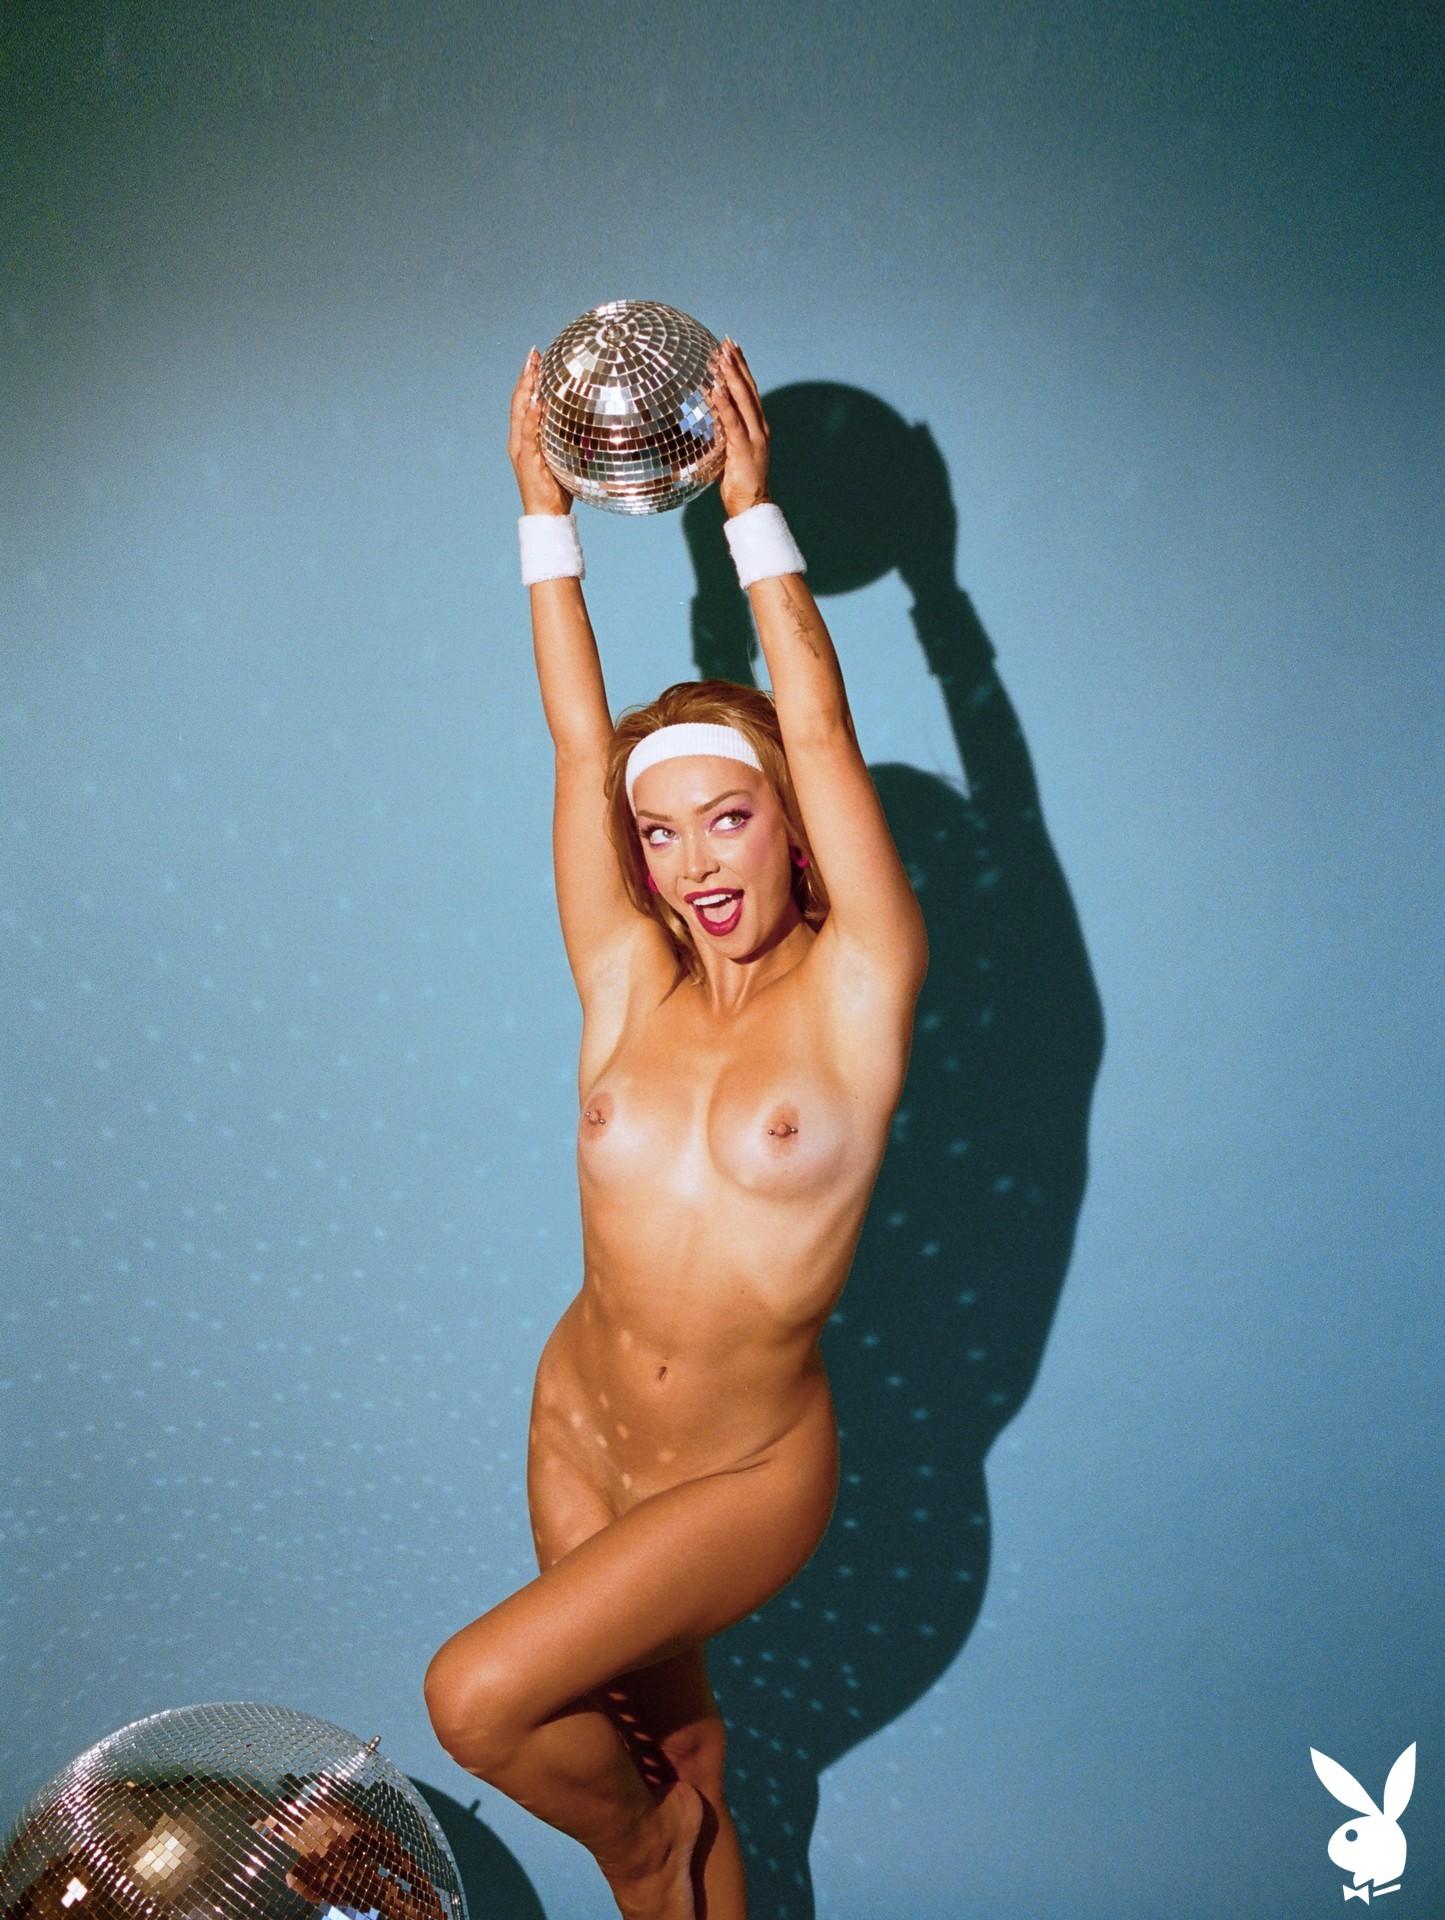 Aubrey Destremps In Let's Get Physical (28)